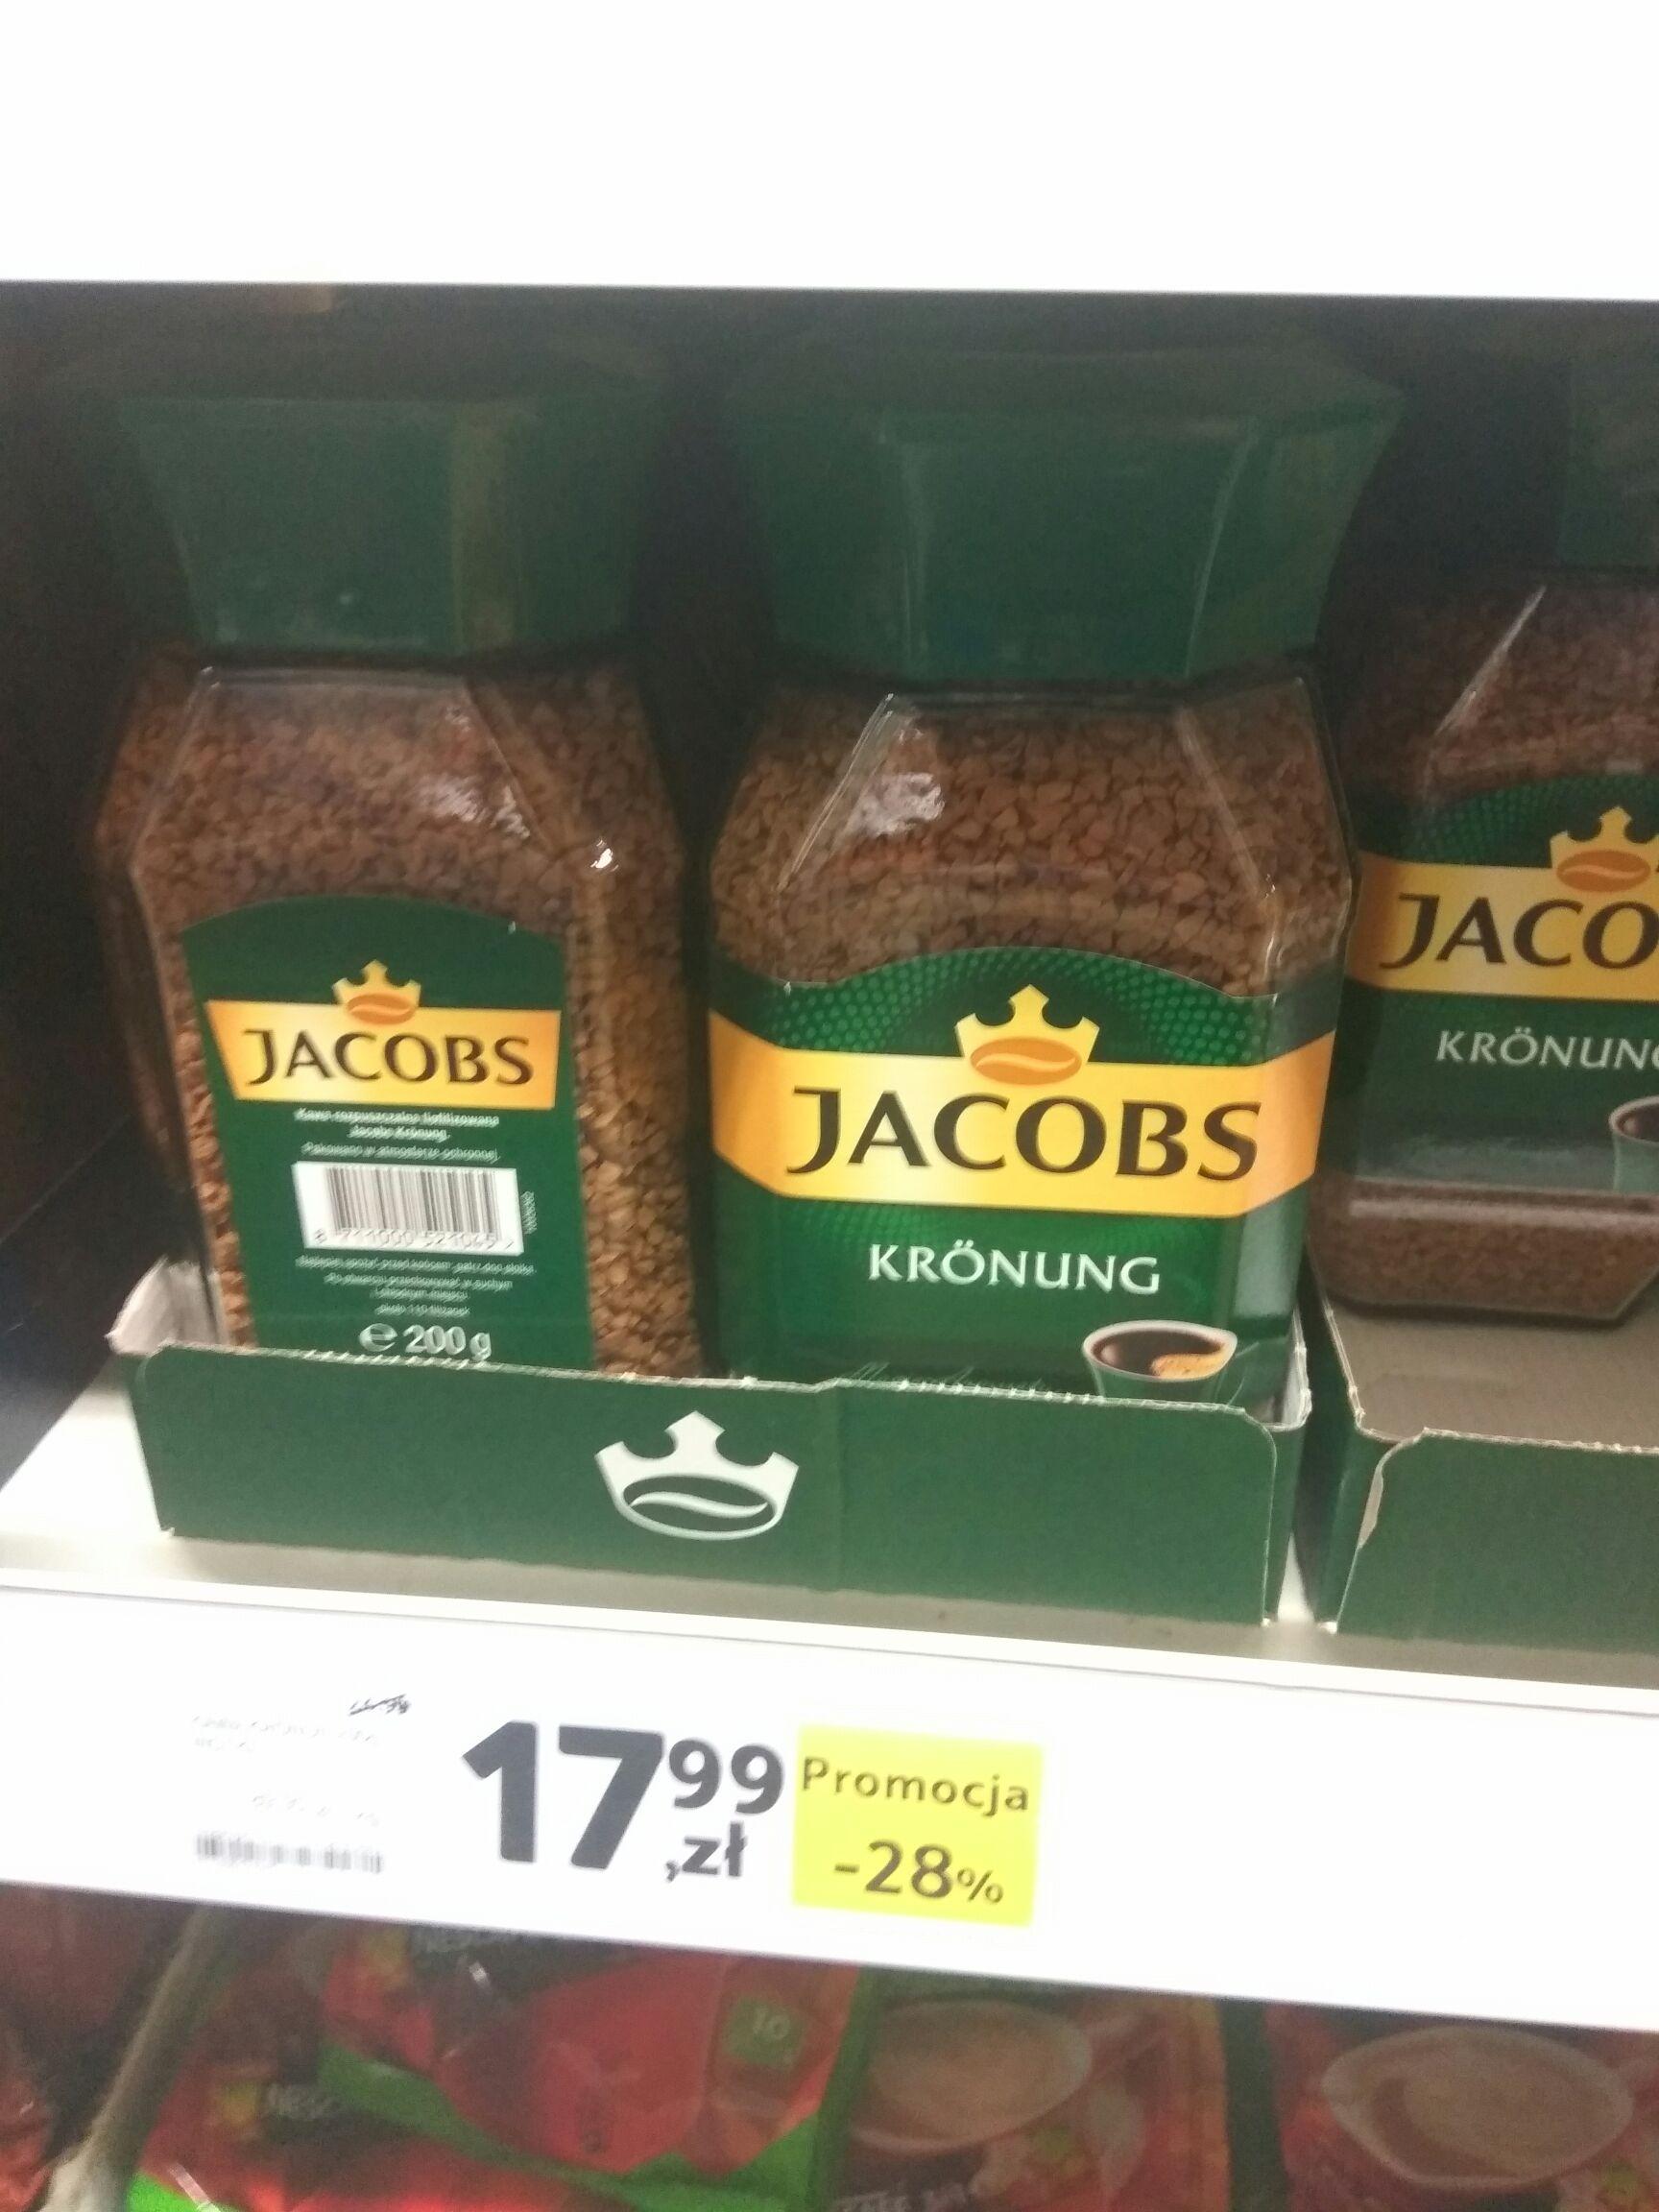 Kawa Jacobs Krönung za 17,99 w Tesco